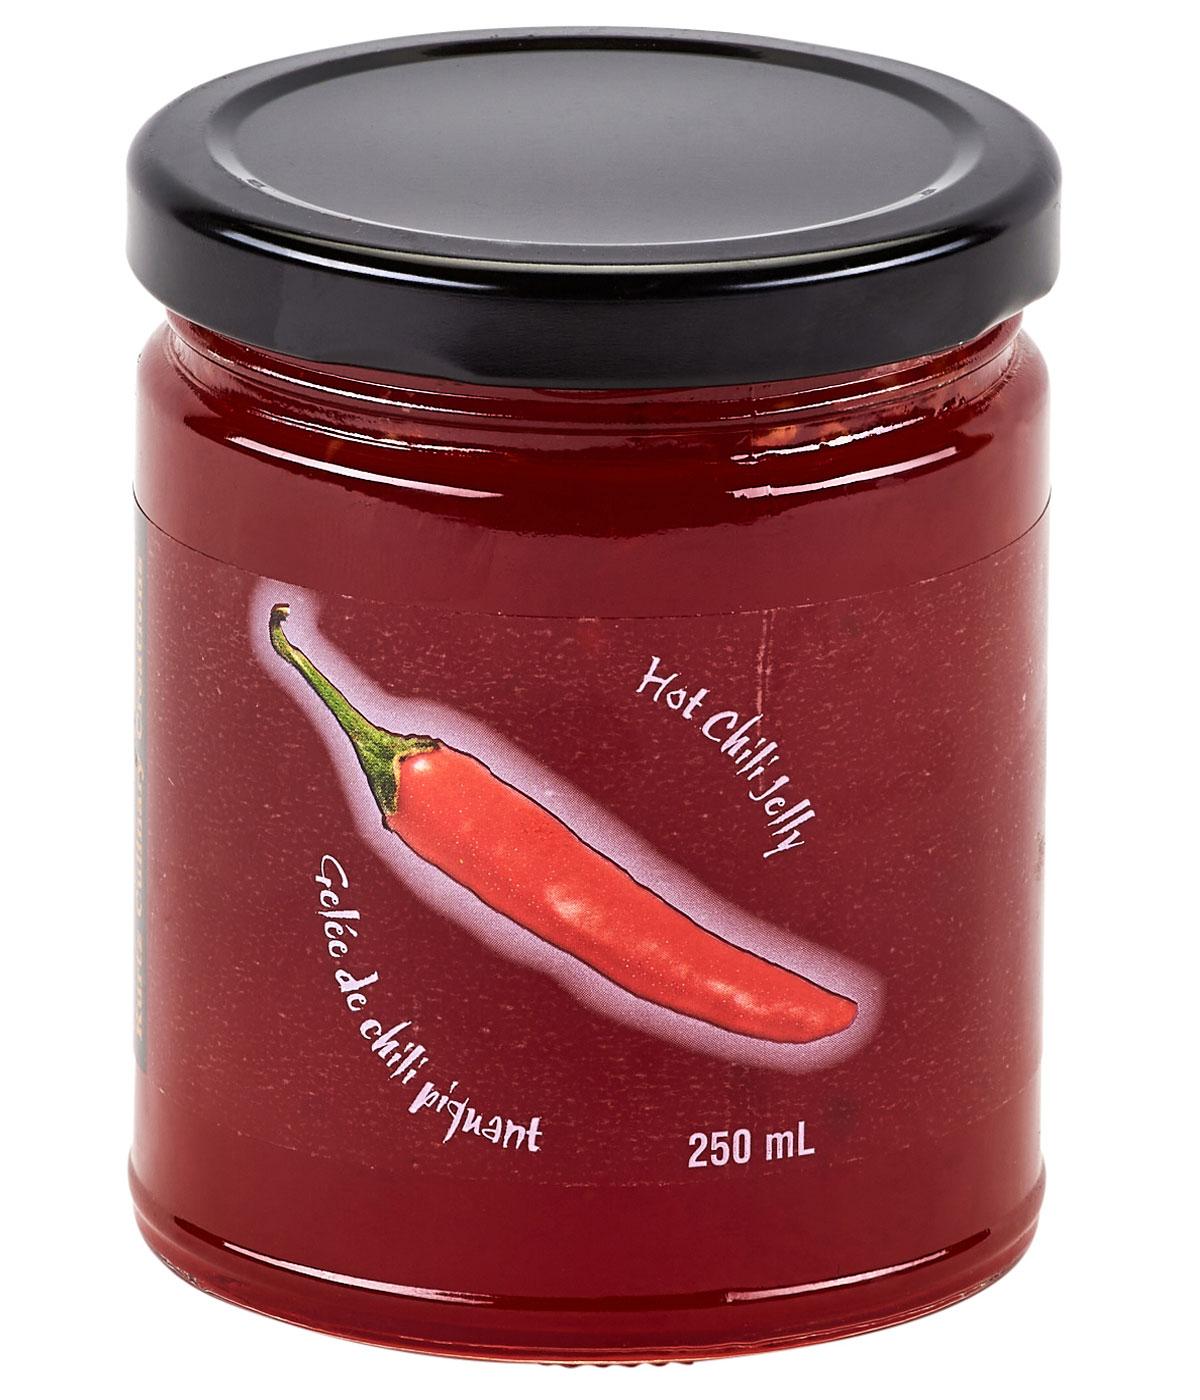 Hot Chili Pepper Jelly